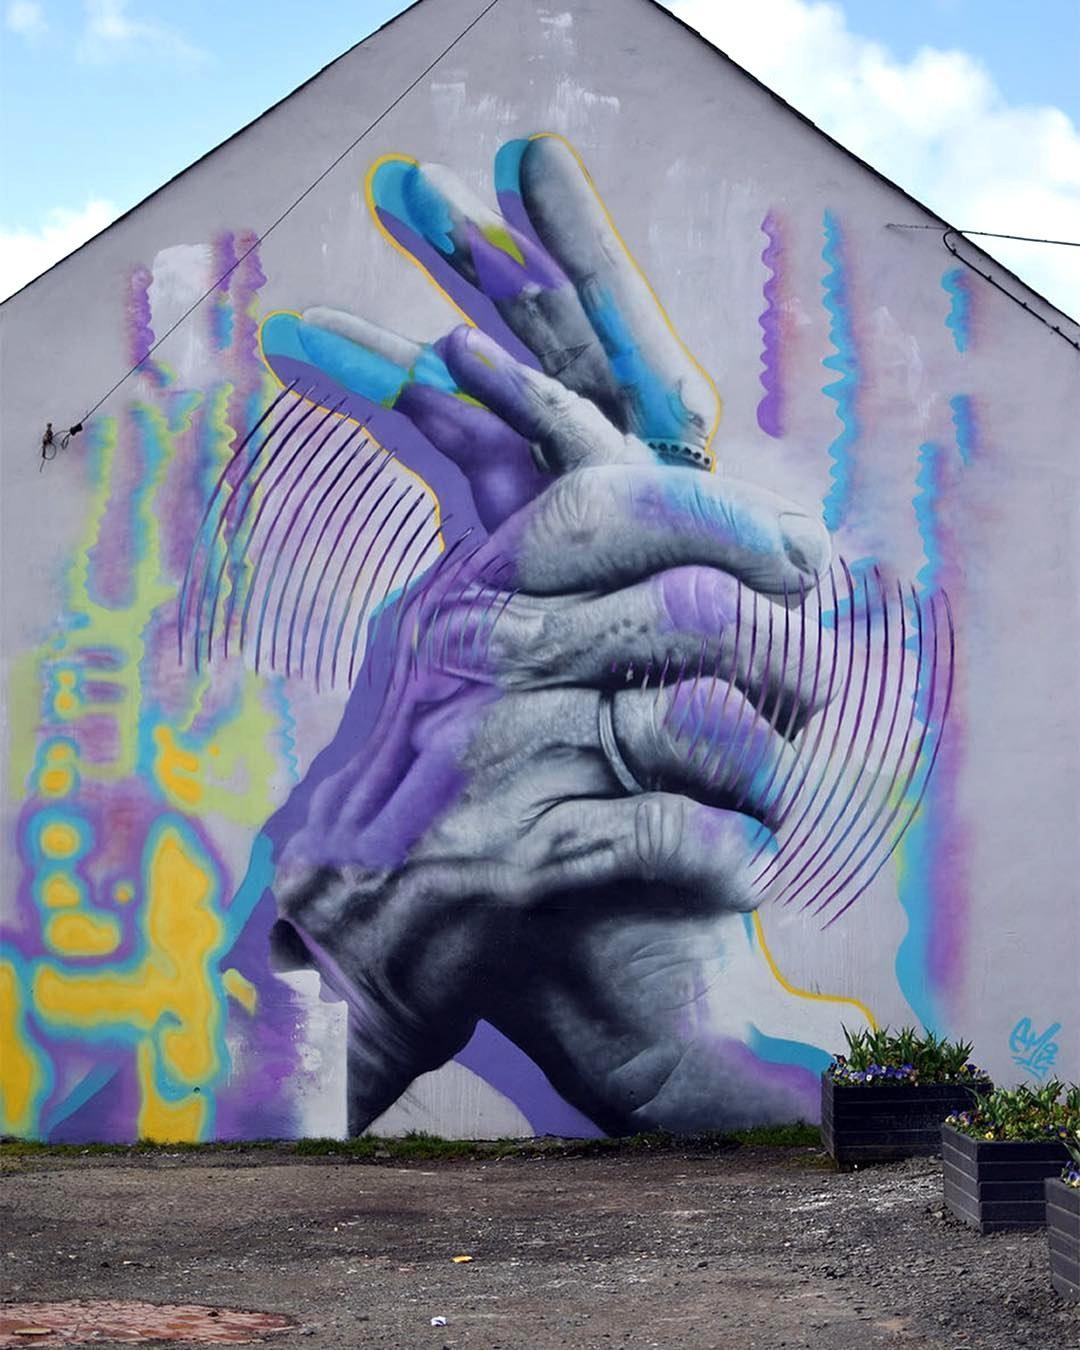 Emic @Ballymena, Northern Ireland, UK